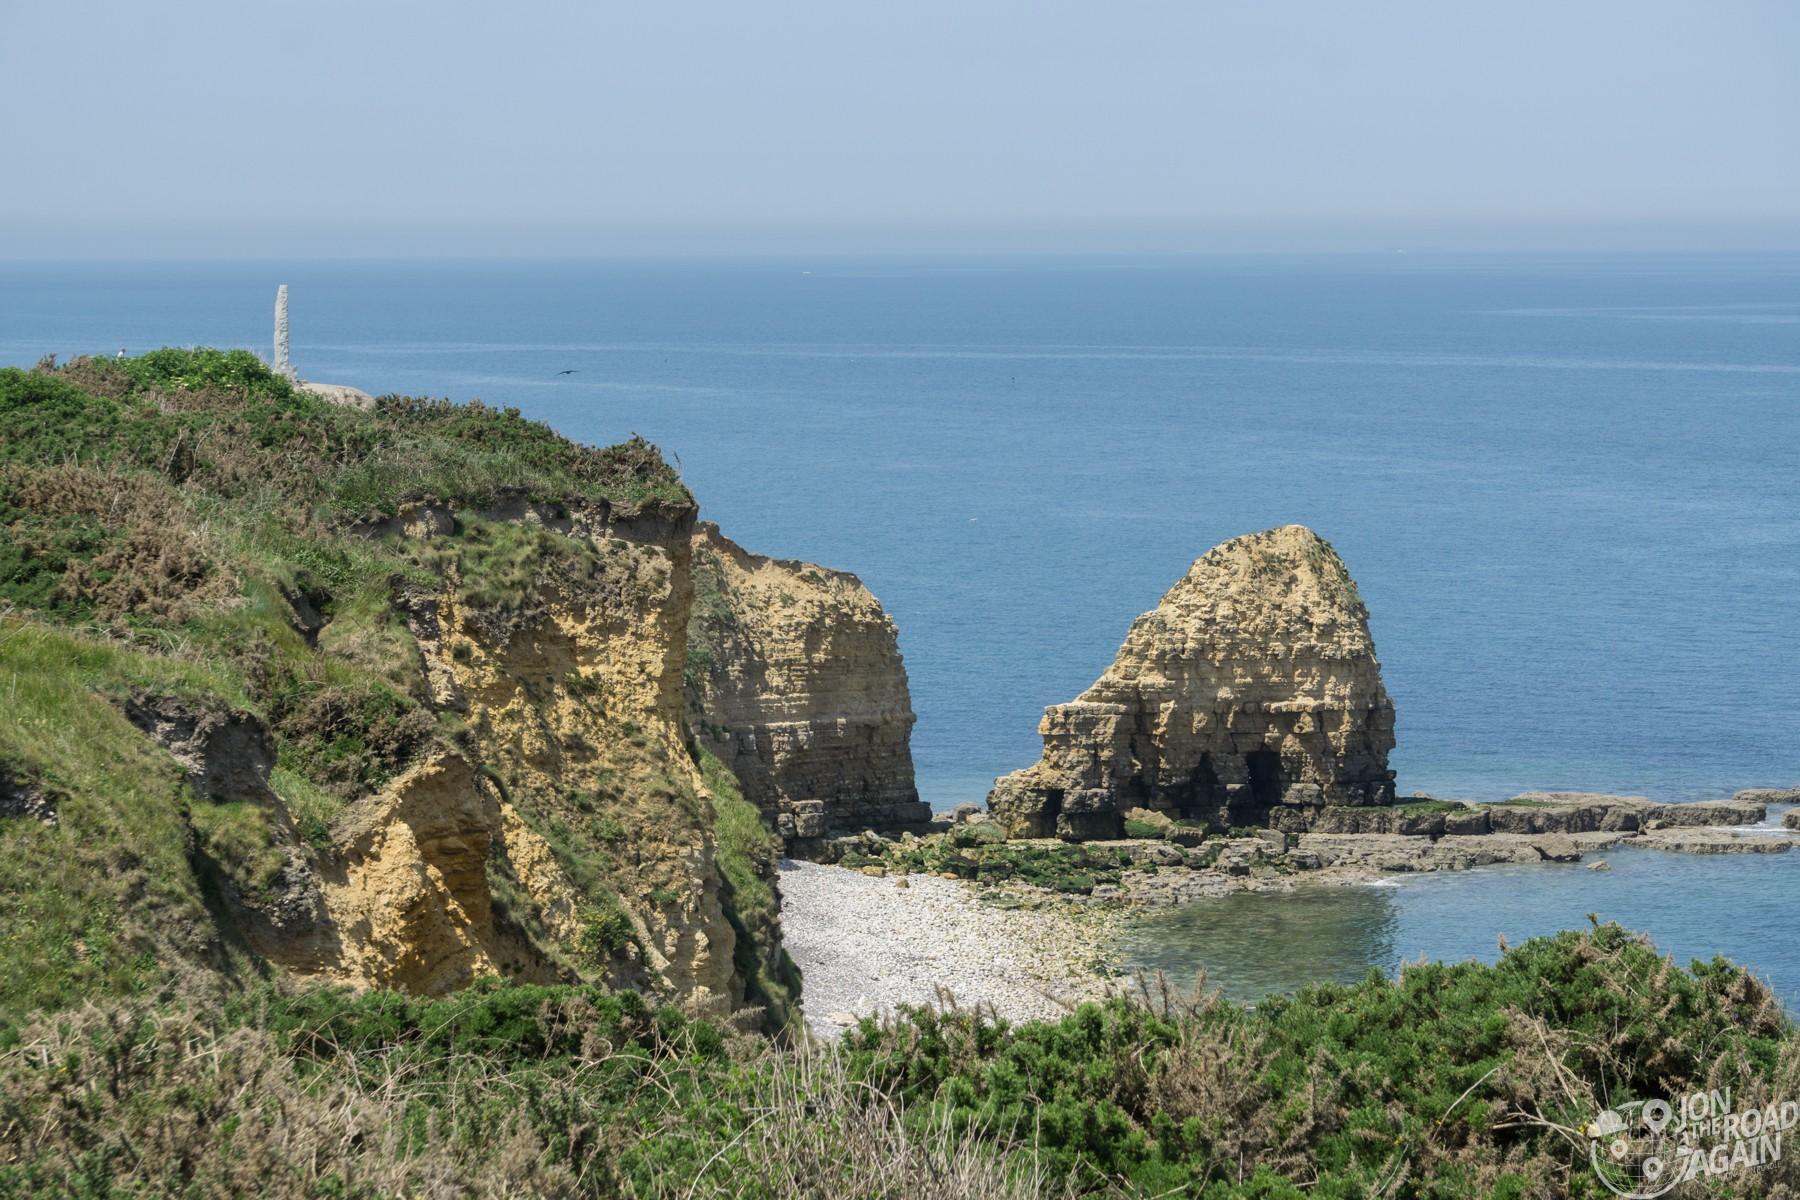 Pointe du Hoc coastline